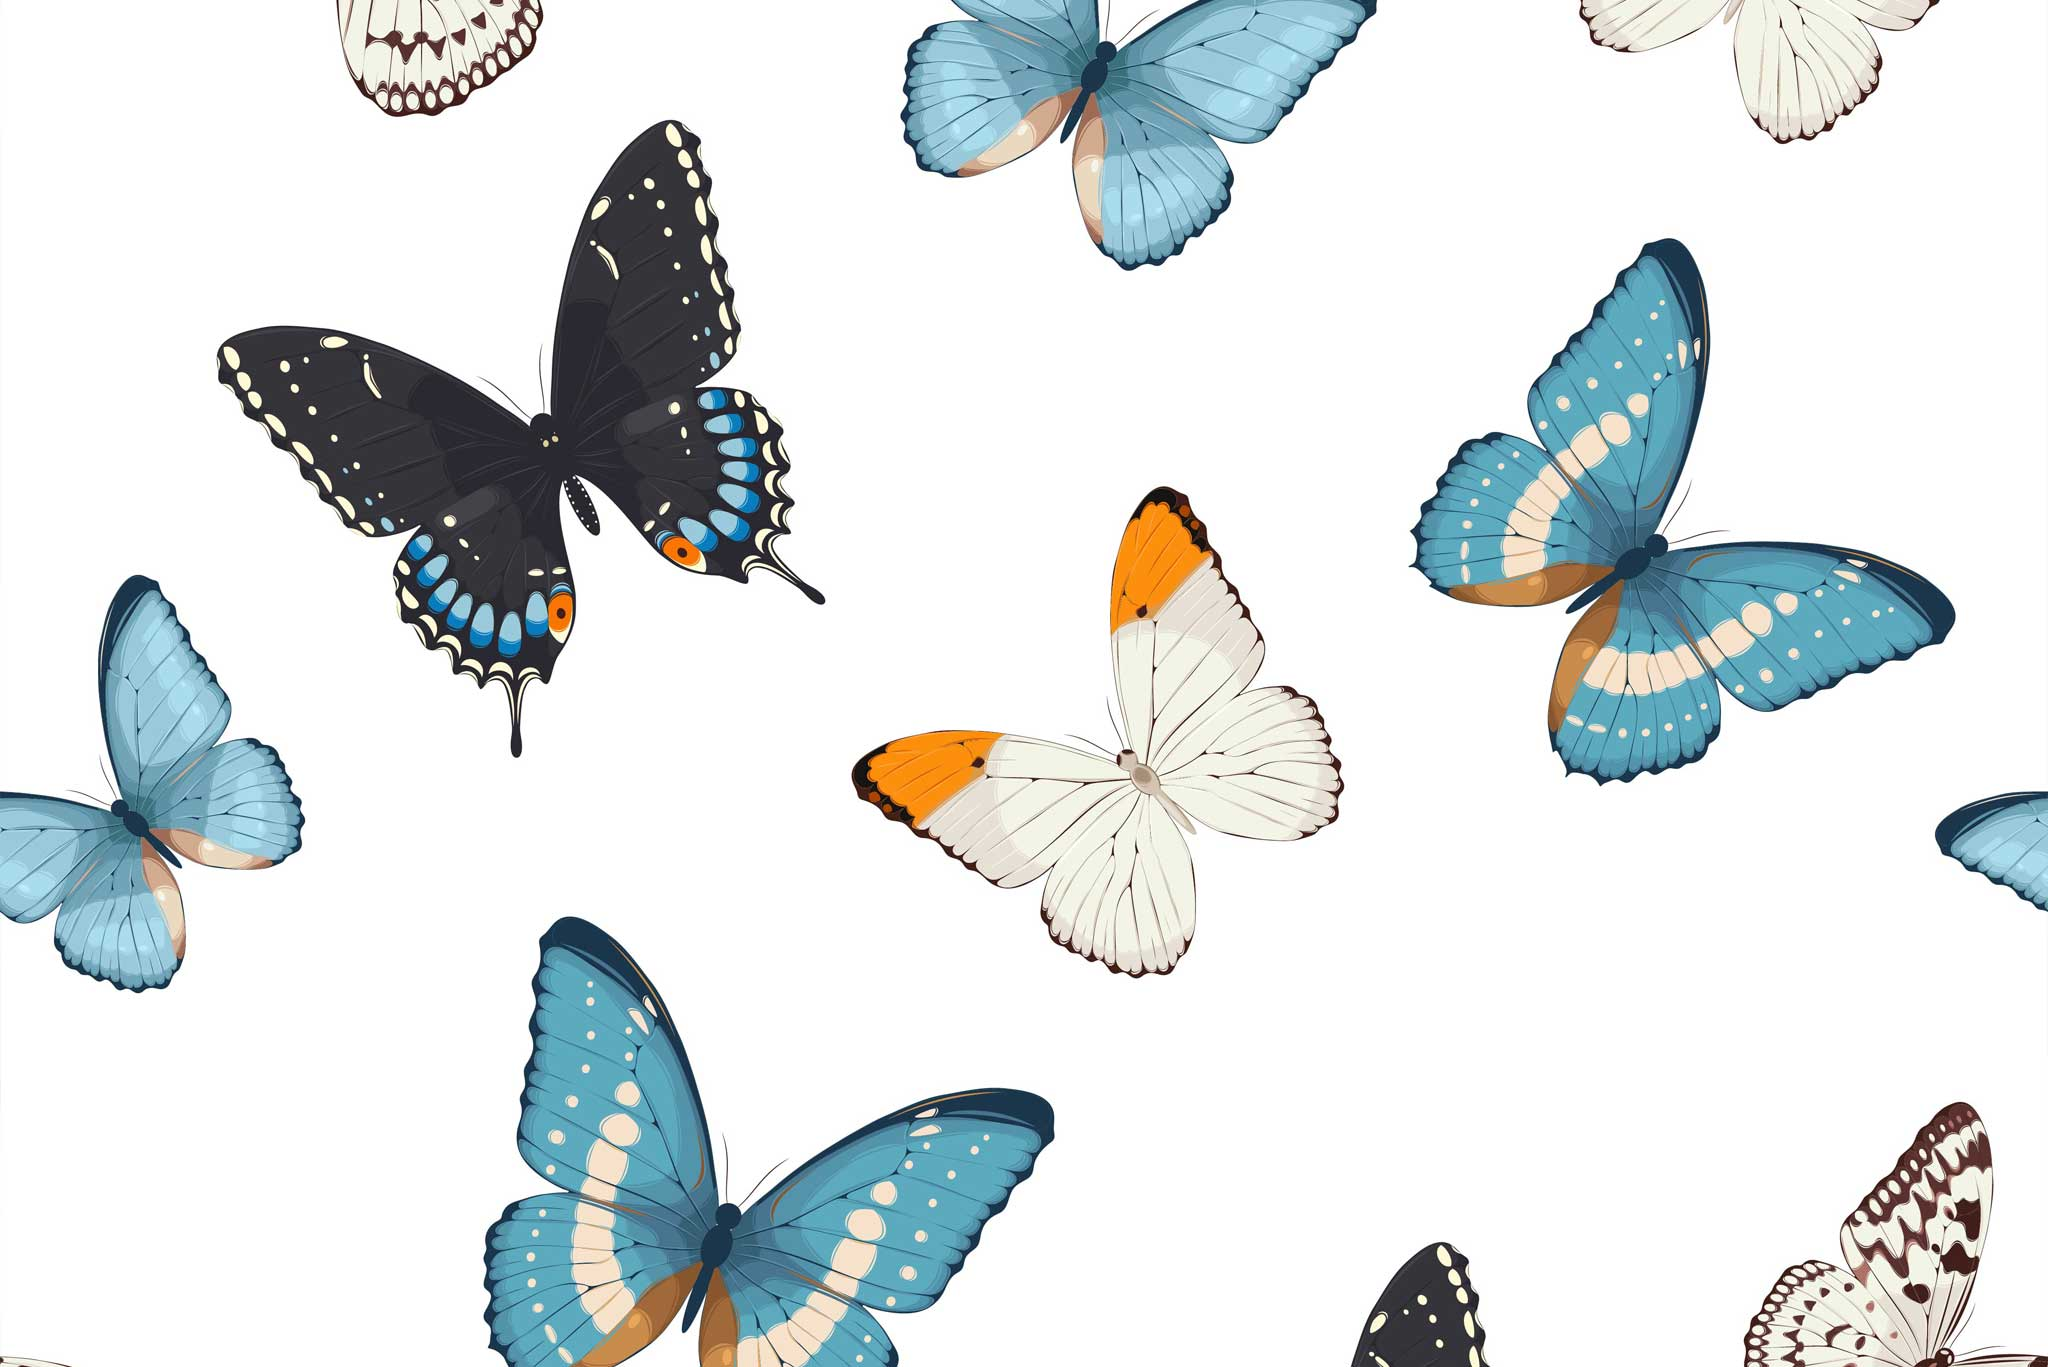 tapet-fototapet-design-decor-mural-customizabil-comanda-personalizat-bucuresti-daring-prints-motiv-model-fluturi-albastri-bleu-fundal-alb